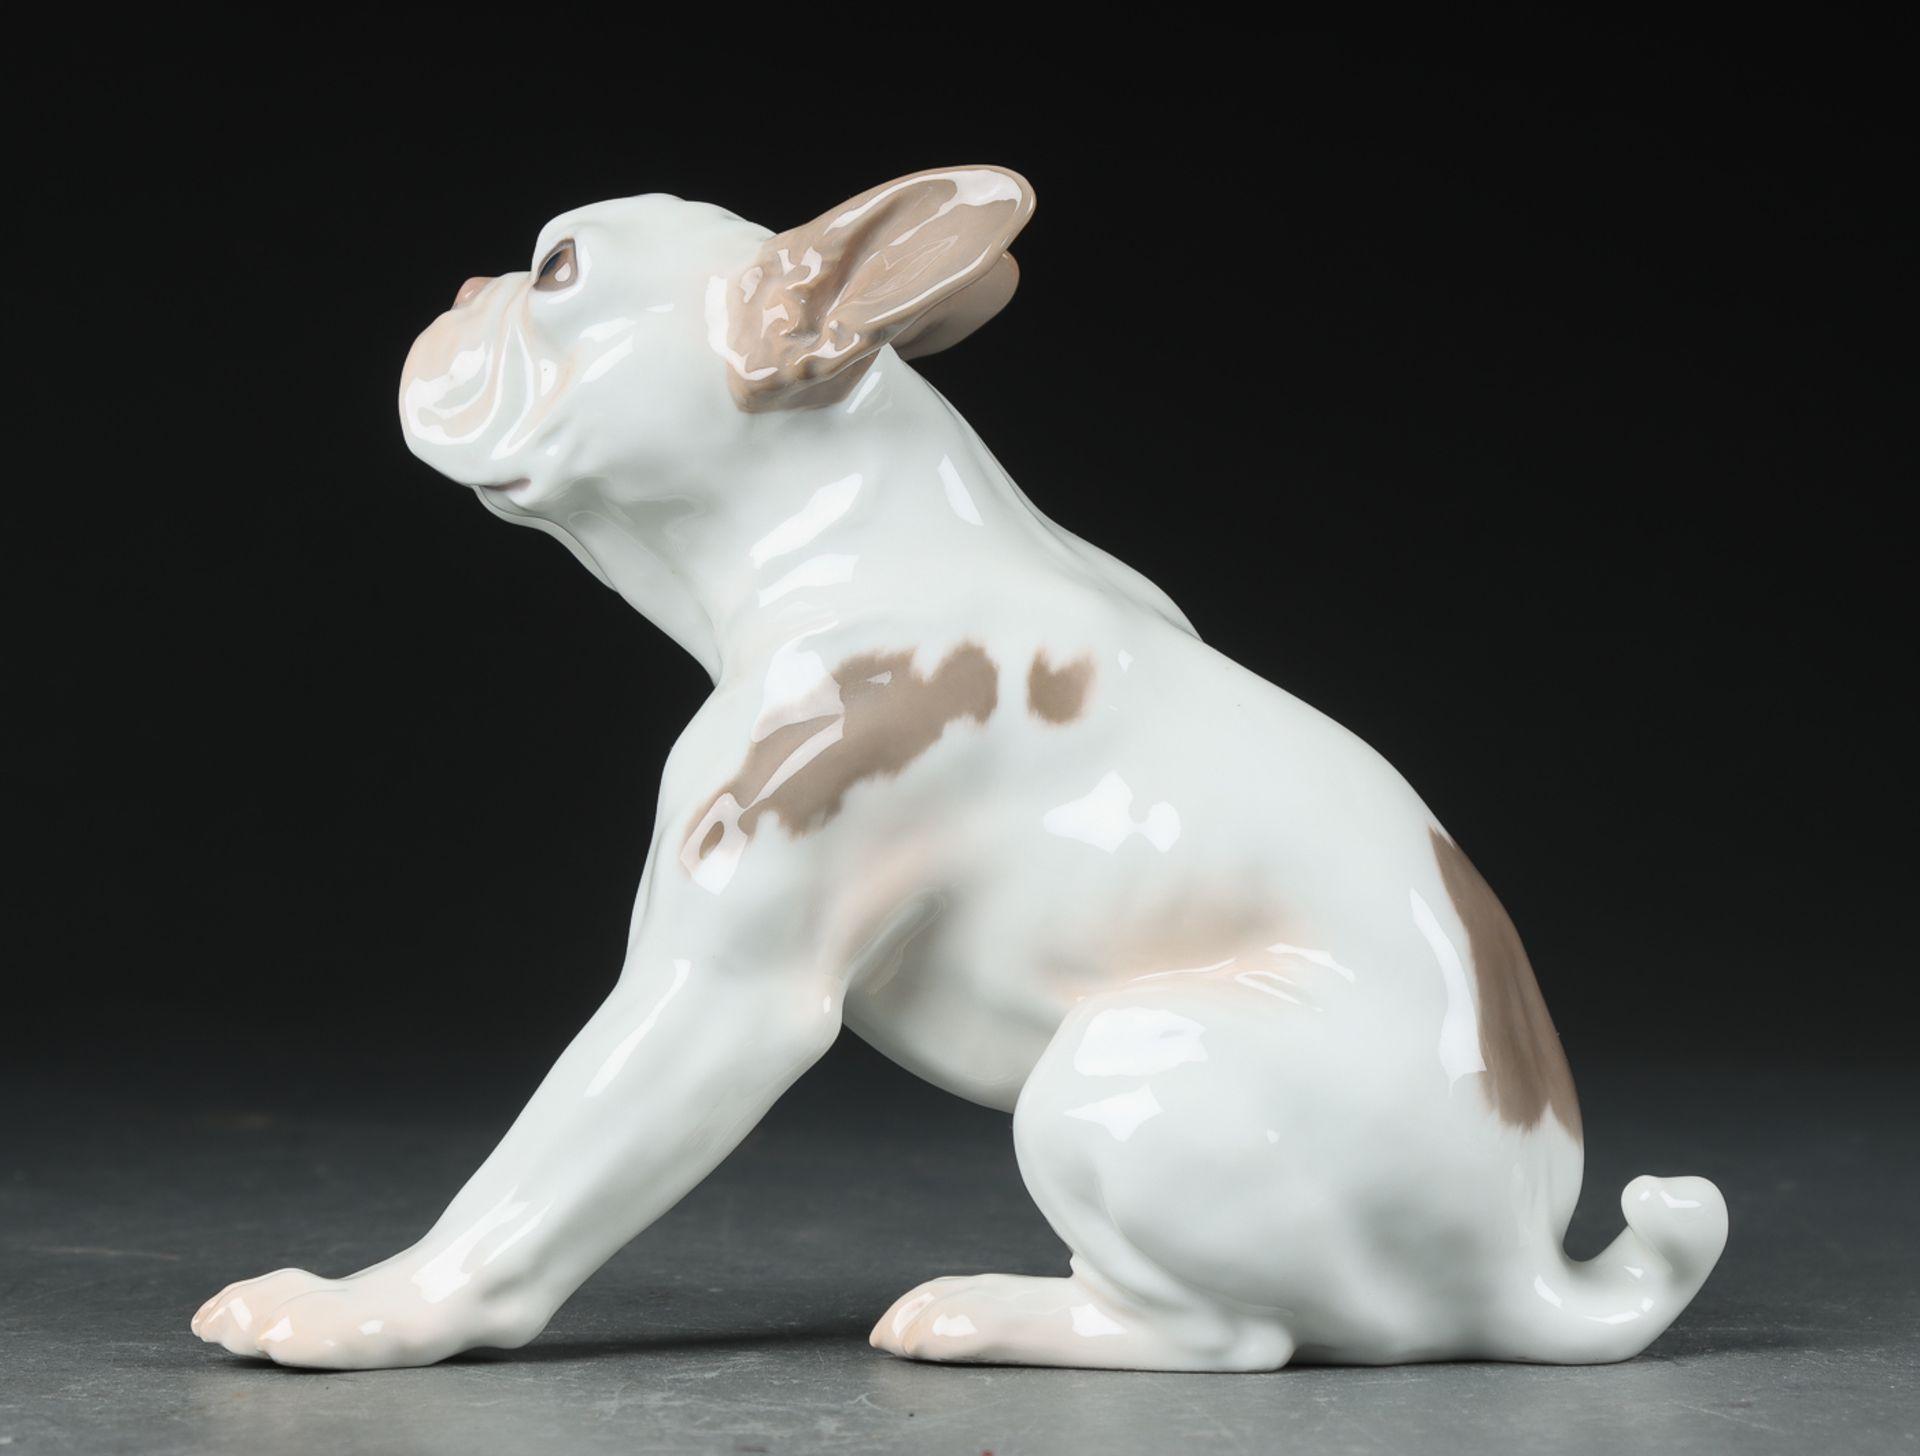 "Dahl Jensen for Bing & Grøndahl. Porzellanfigur. Französische Bulldogge sog. ""Bully"", nr. 2000. II. - Bild 2 aus 3"